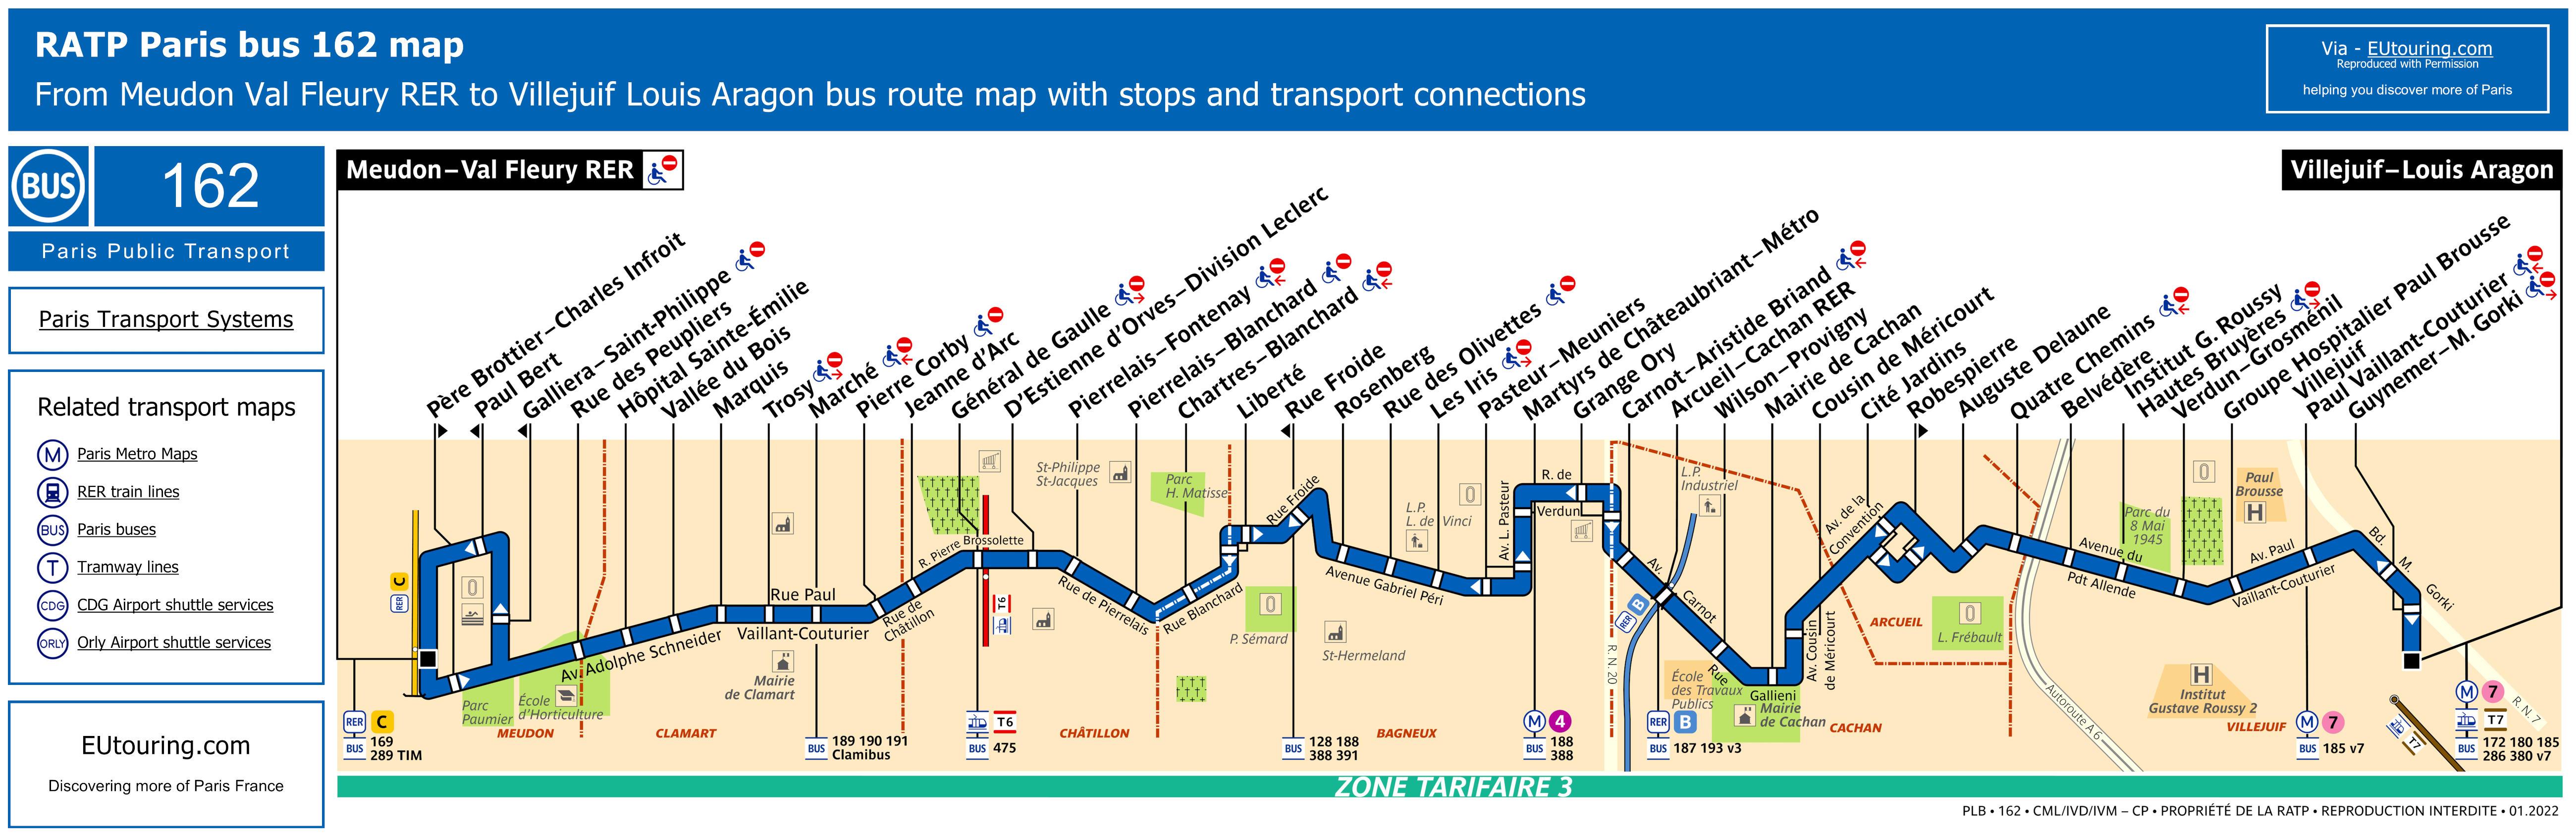 ratp route maps for paris bus lines 160 through to 169